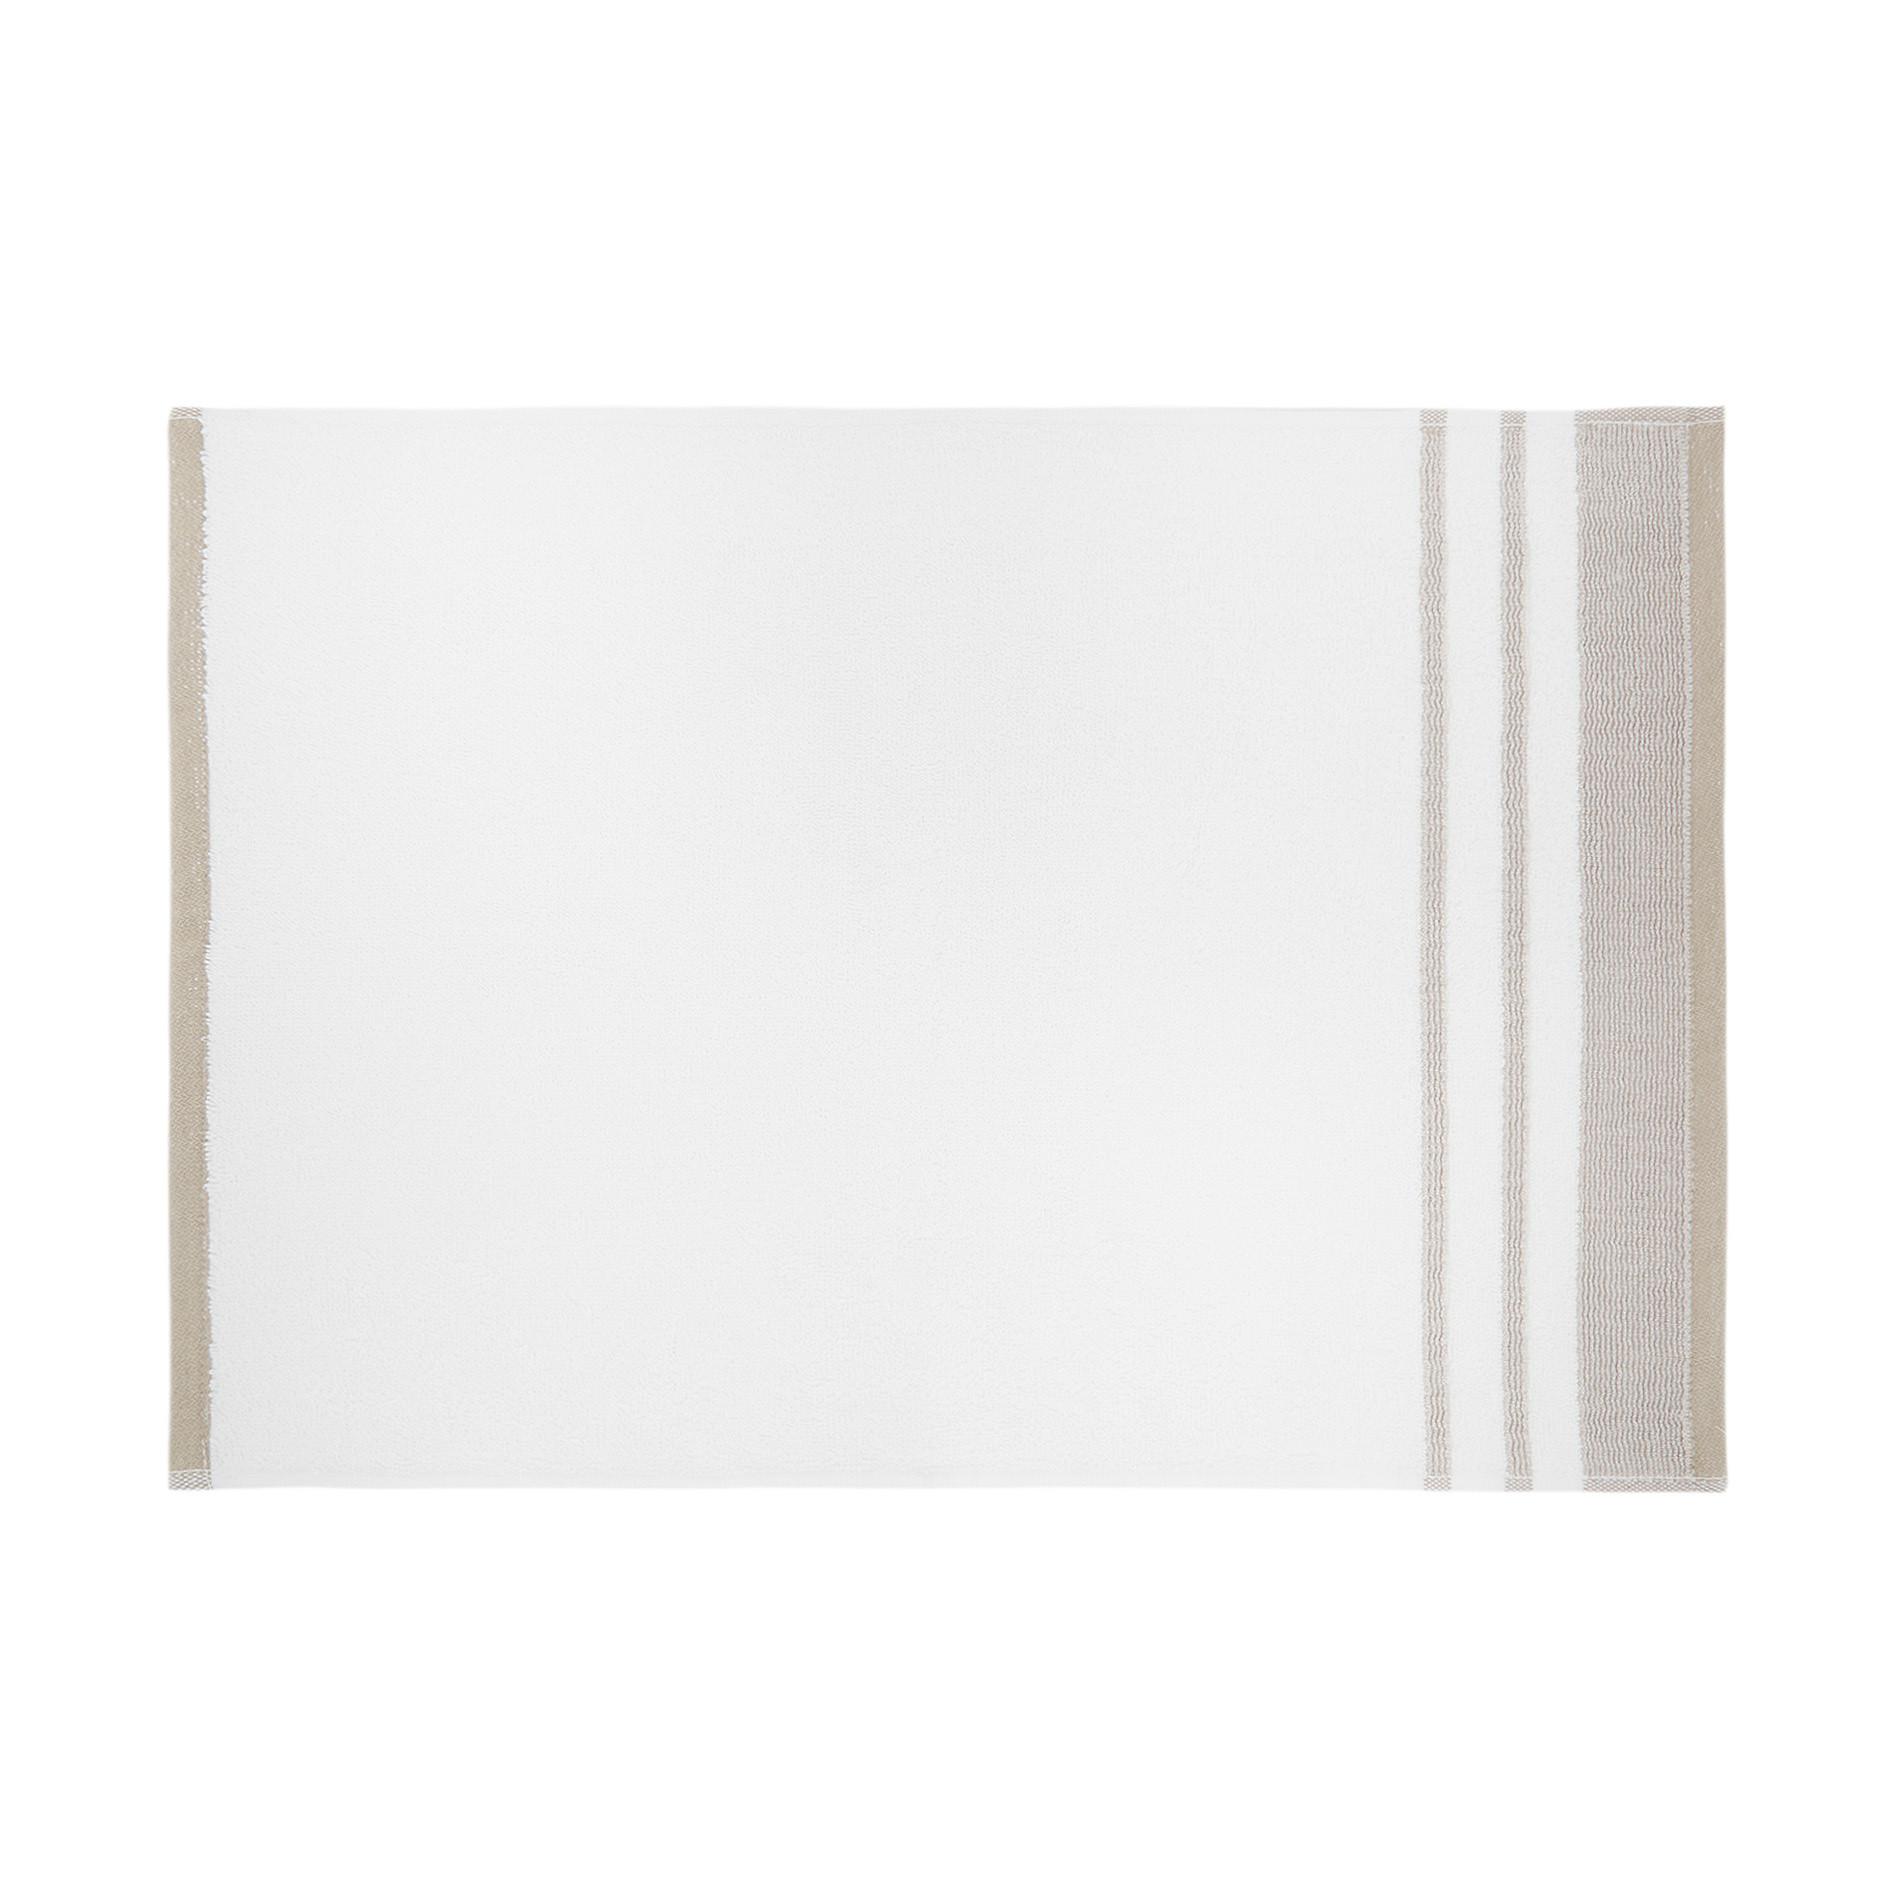 Asciugamano spugna di cotone balza goffrata, Beige scuro, large image number 2